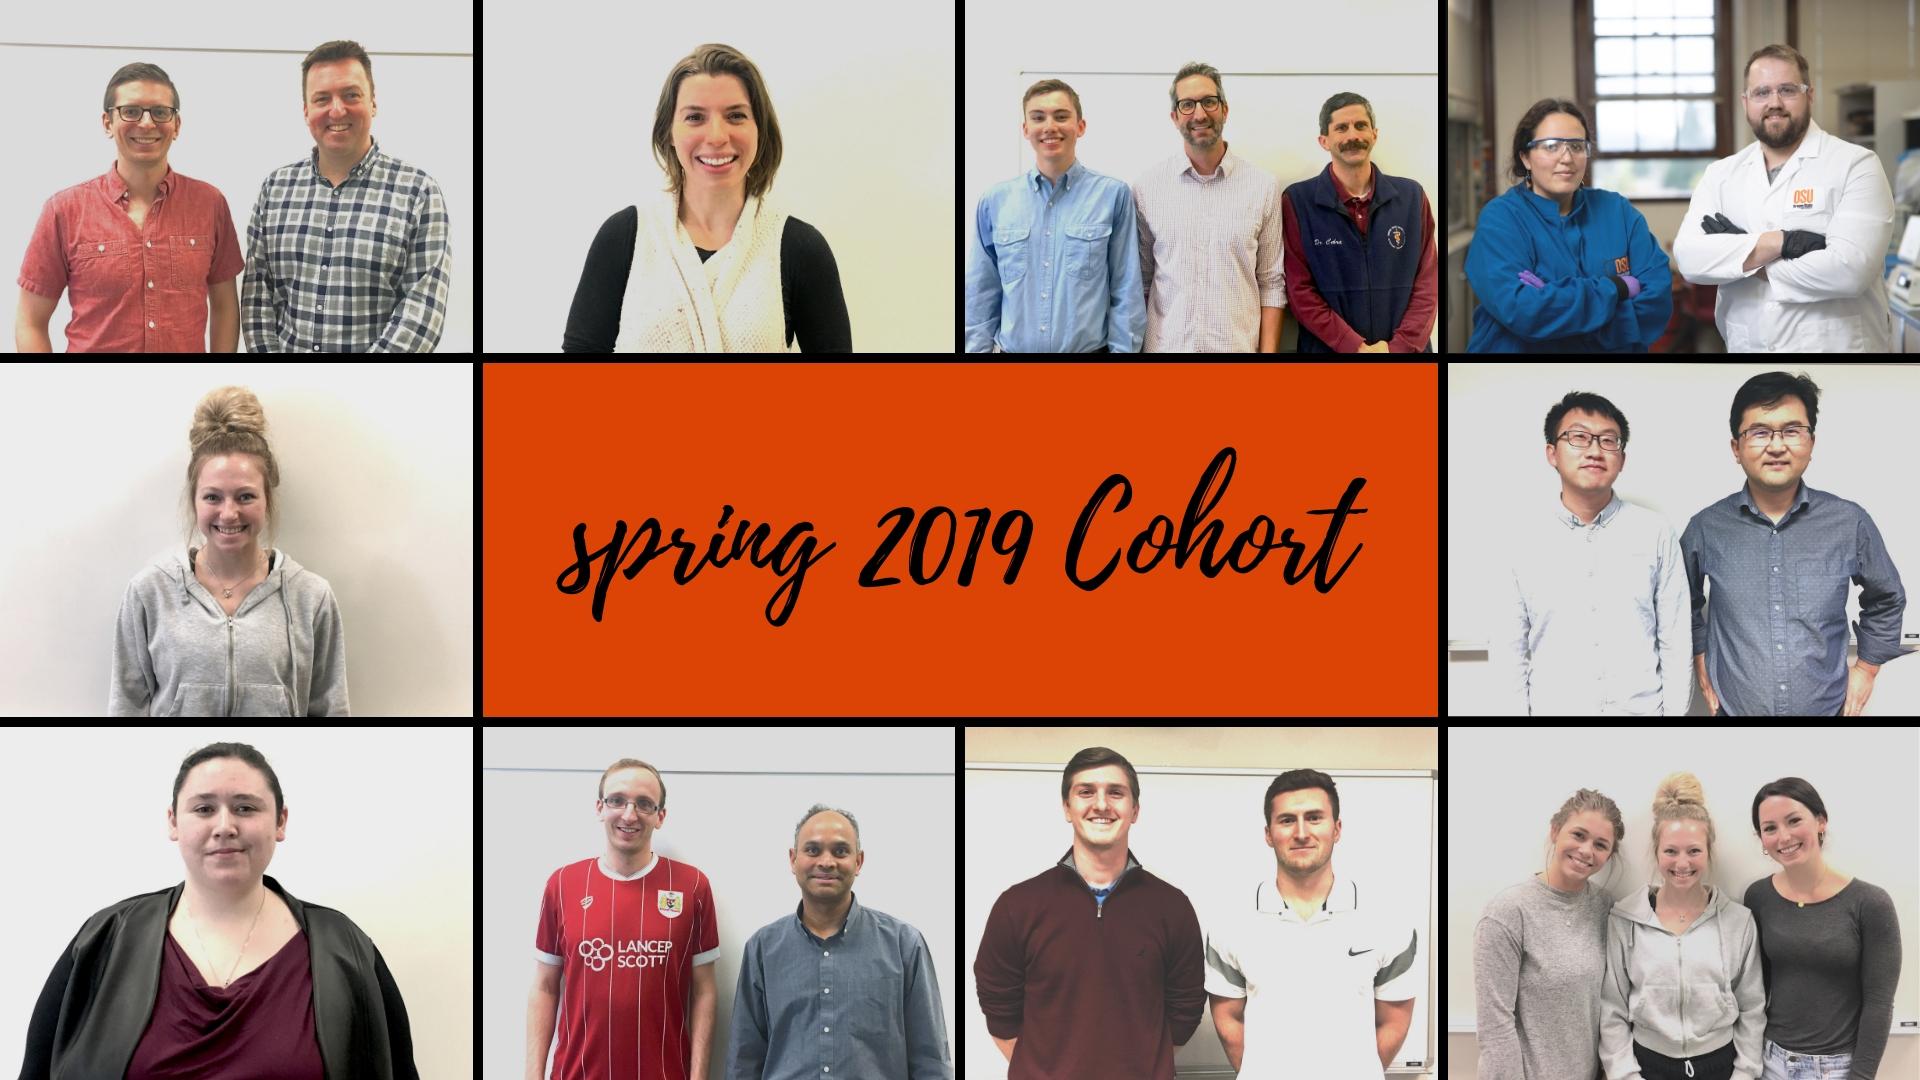 Accelerate Spring 2019 Cohort - OSU Advantage Accelerator program